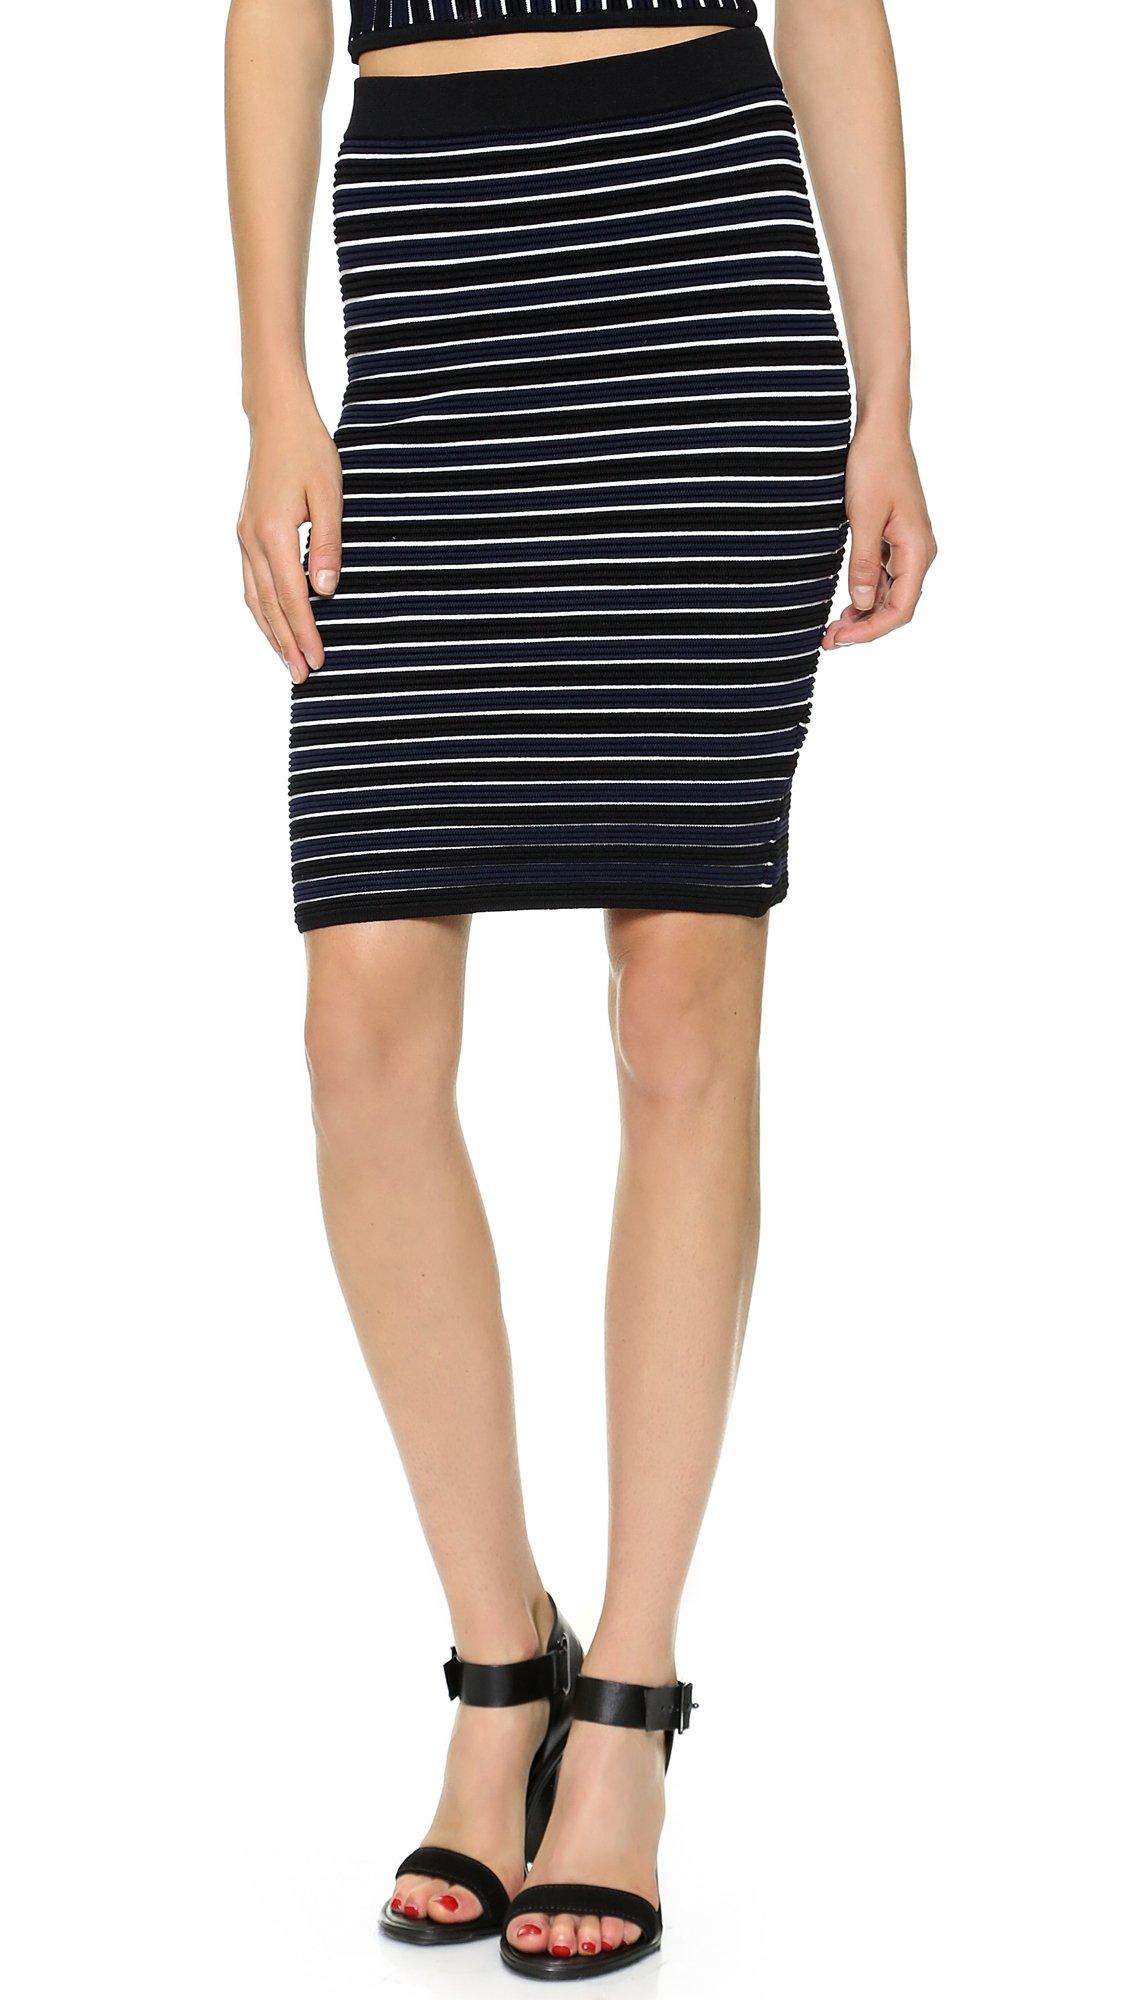 Jonathan Simkhai Knit Ribbed Pencil Skirt - Navy/Black ...